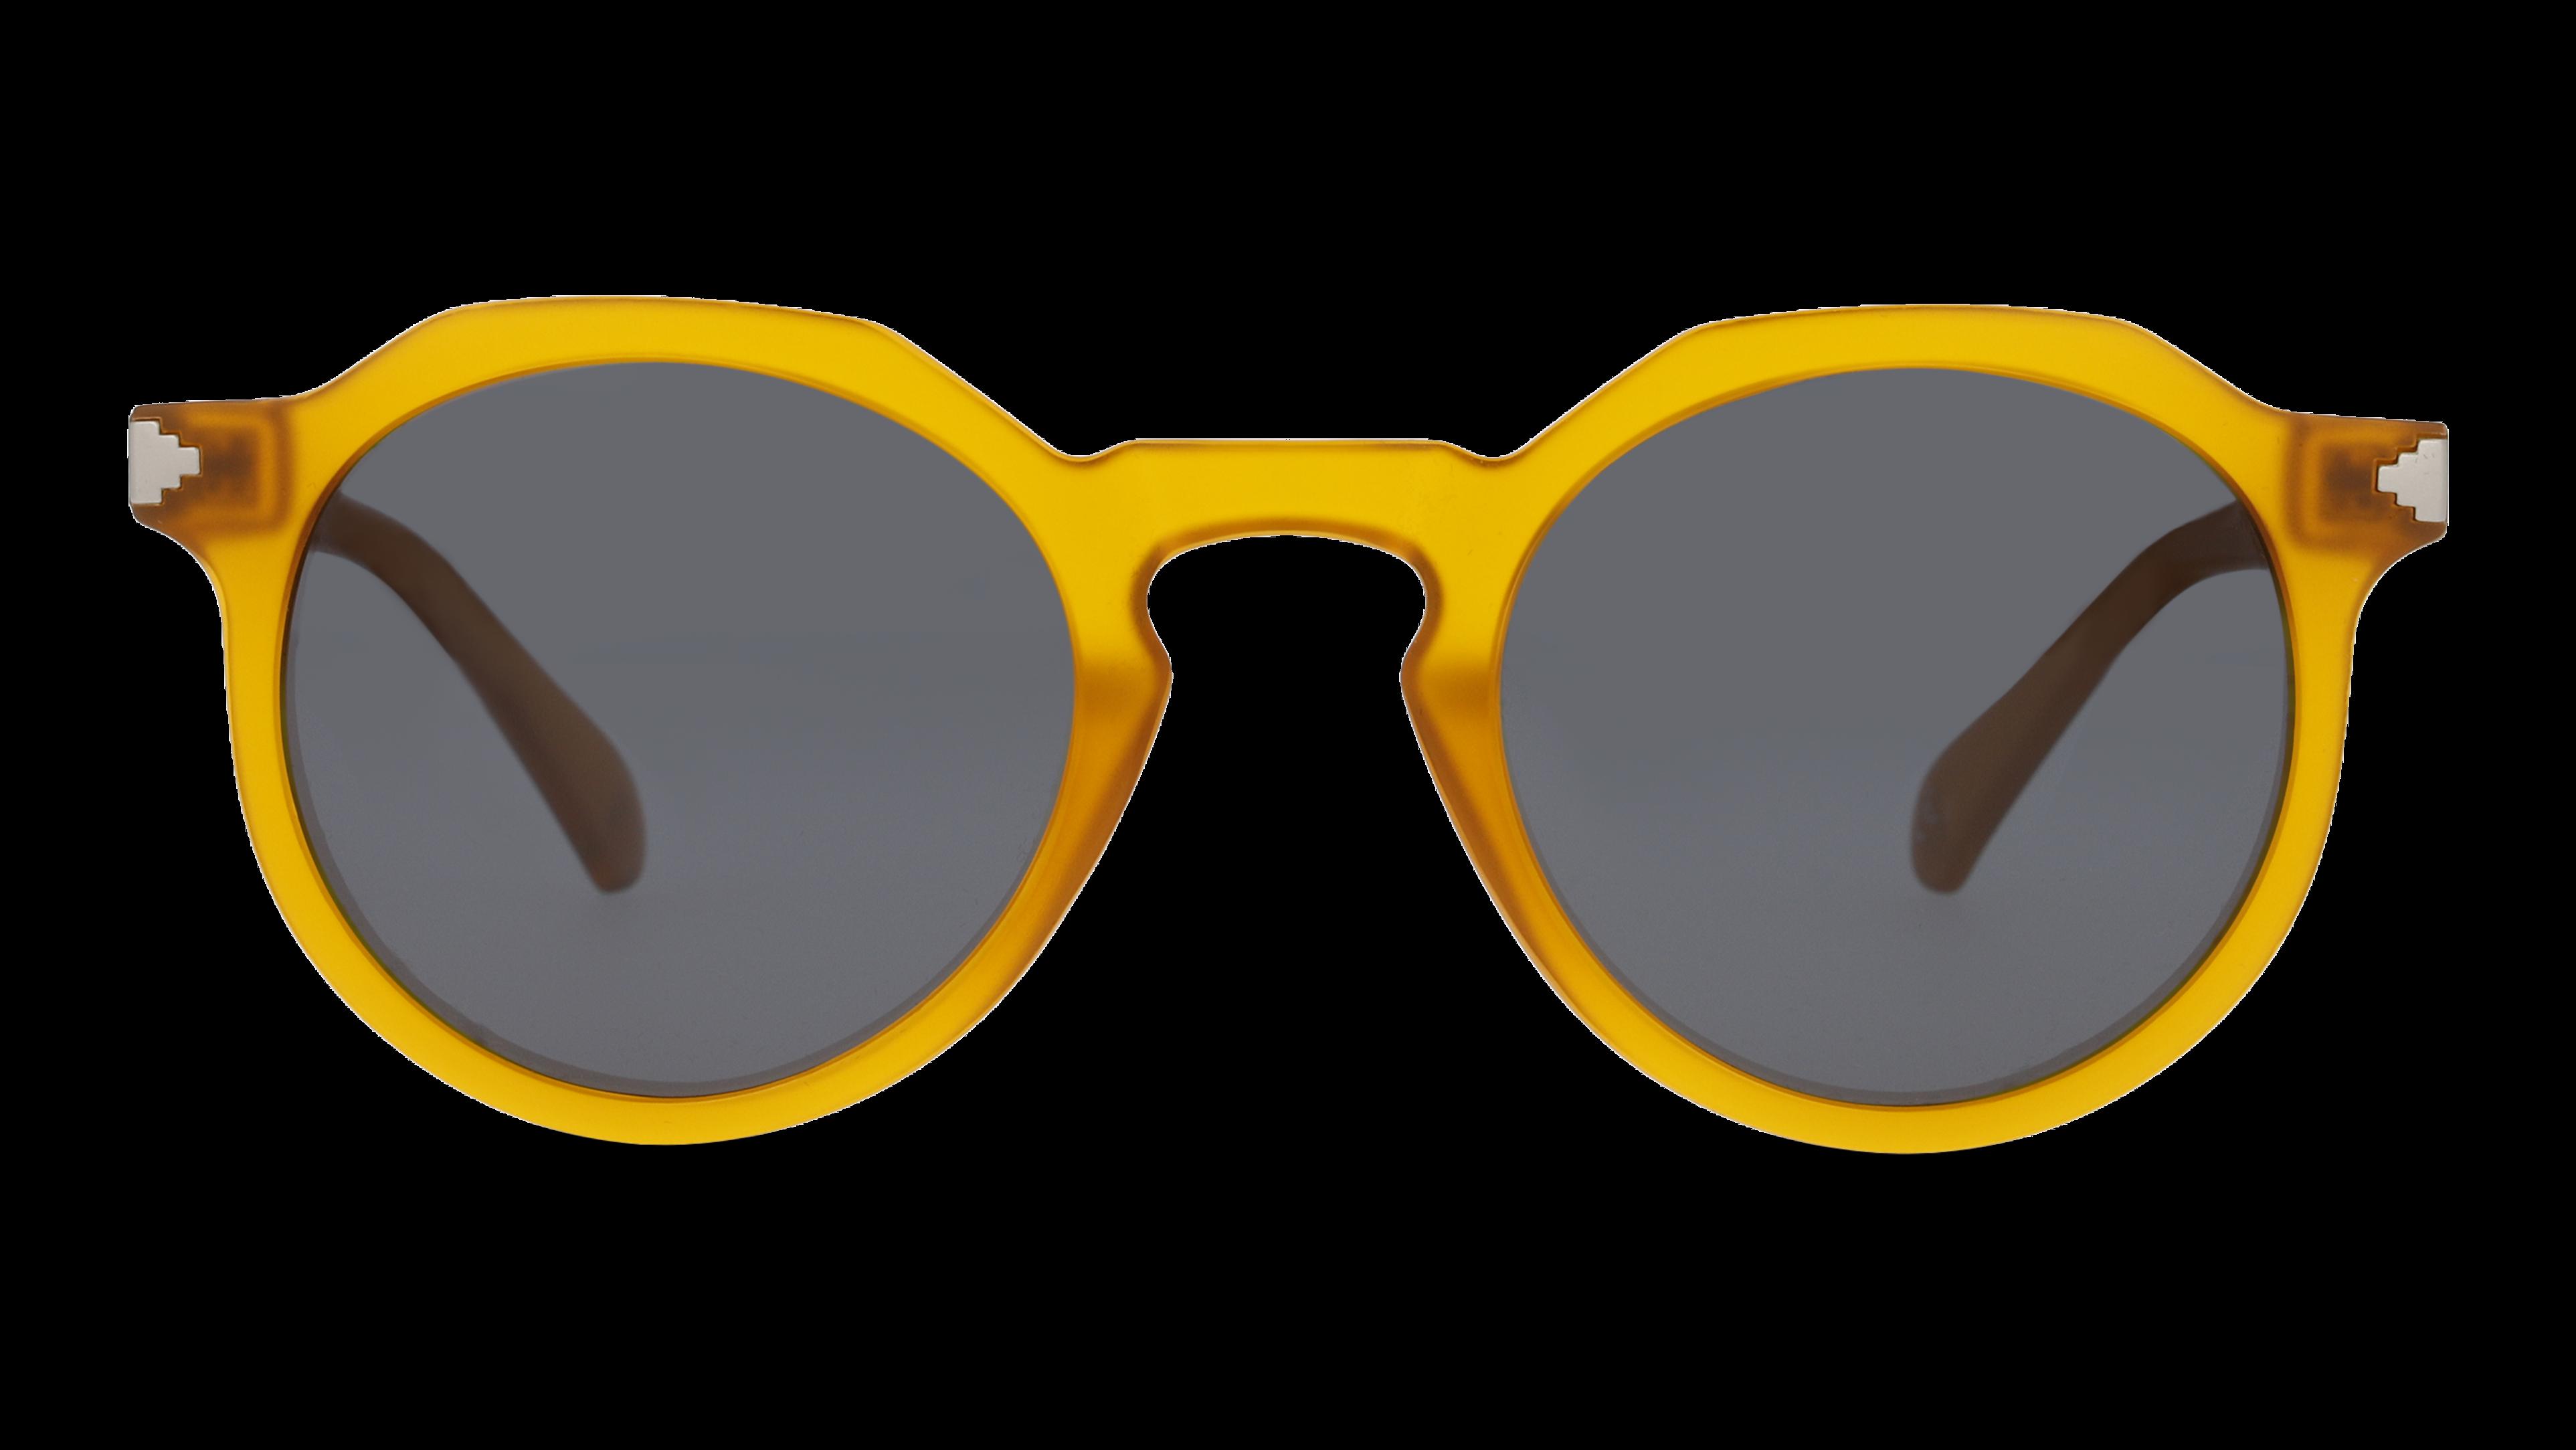 Front Karun Karün SWFS0111 Yellow Cry 50/26 Geel, Transparant/Grijs